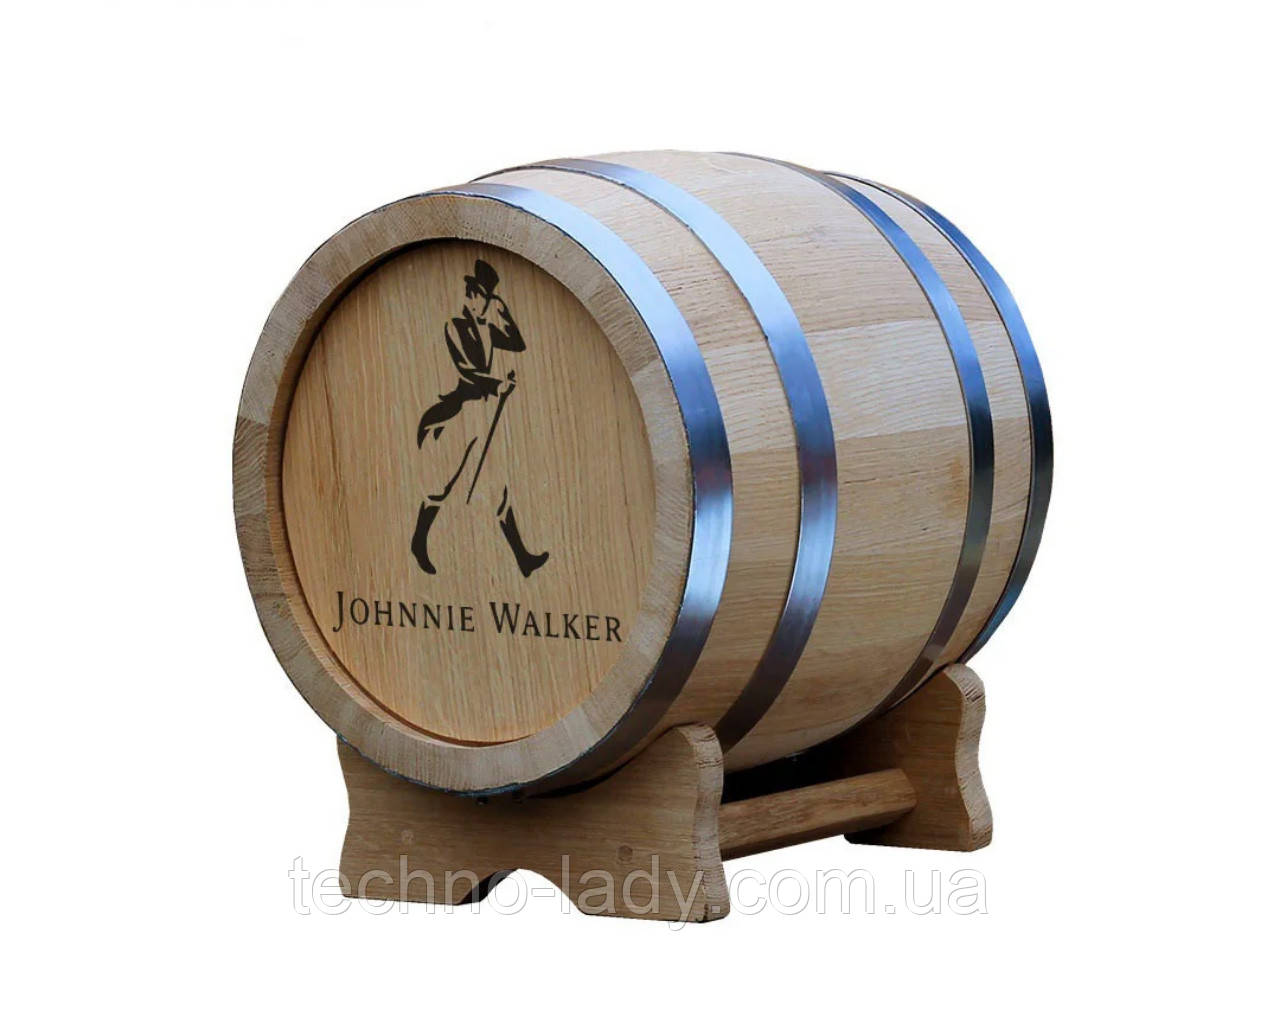 Бочка с гравировкой Johnnie Walker (Джонни Уокер) #108